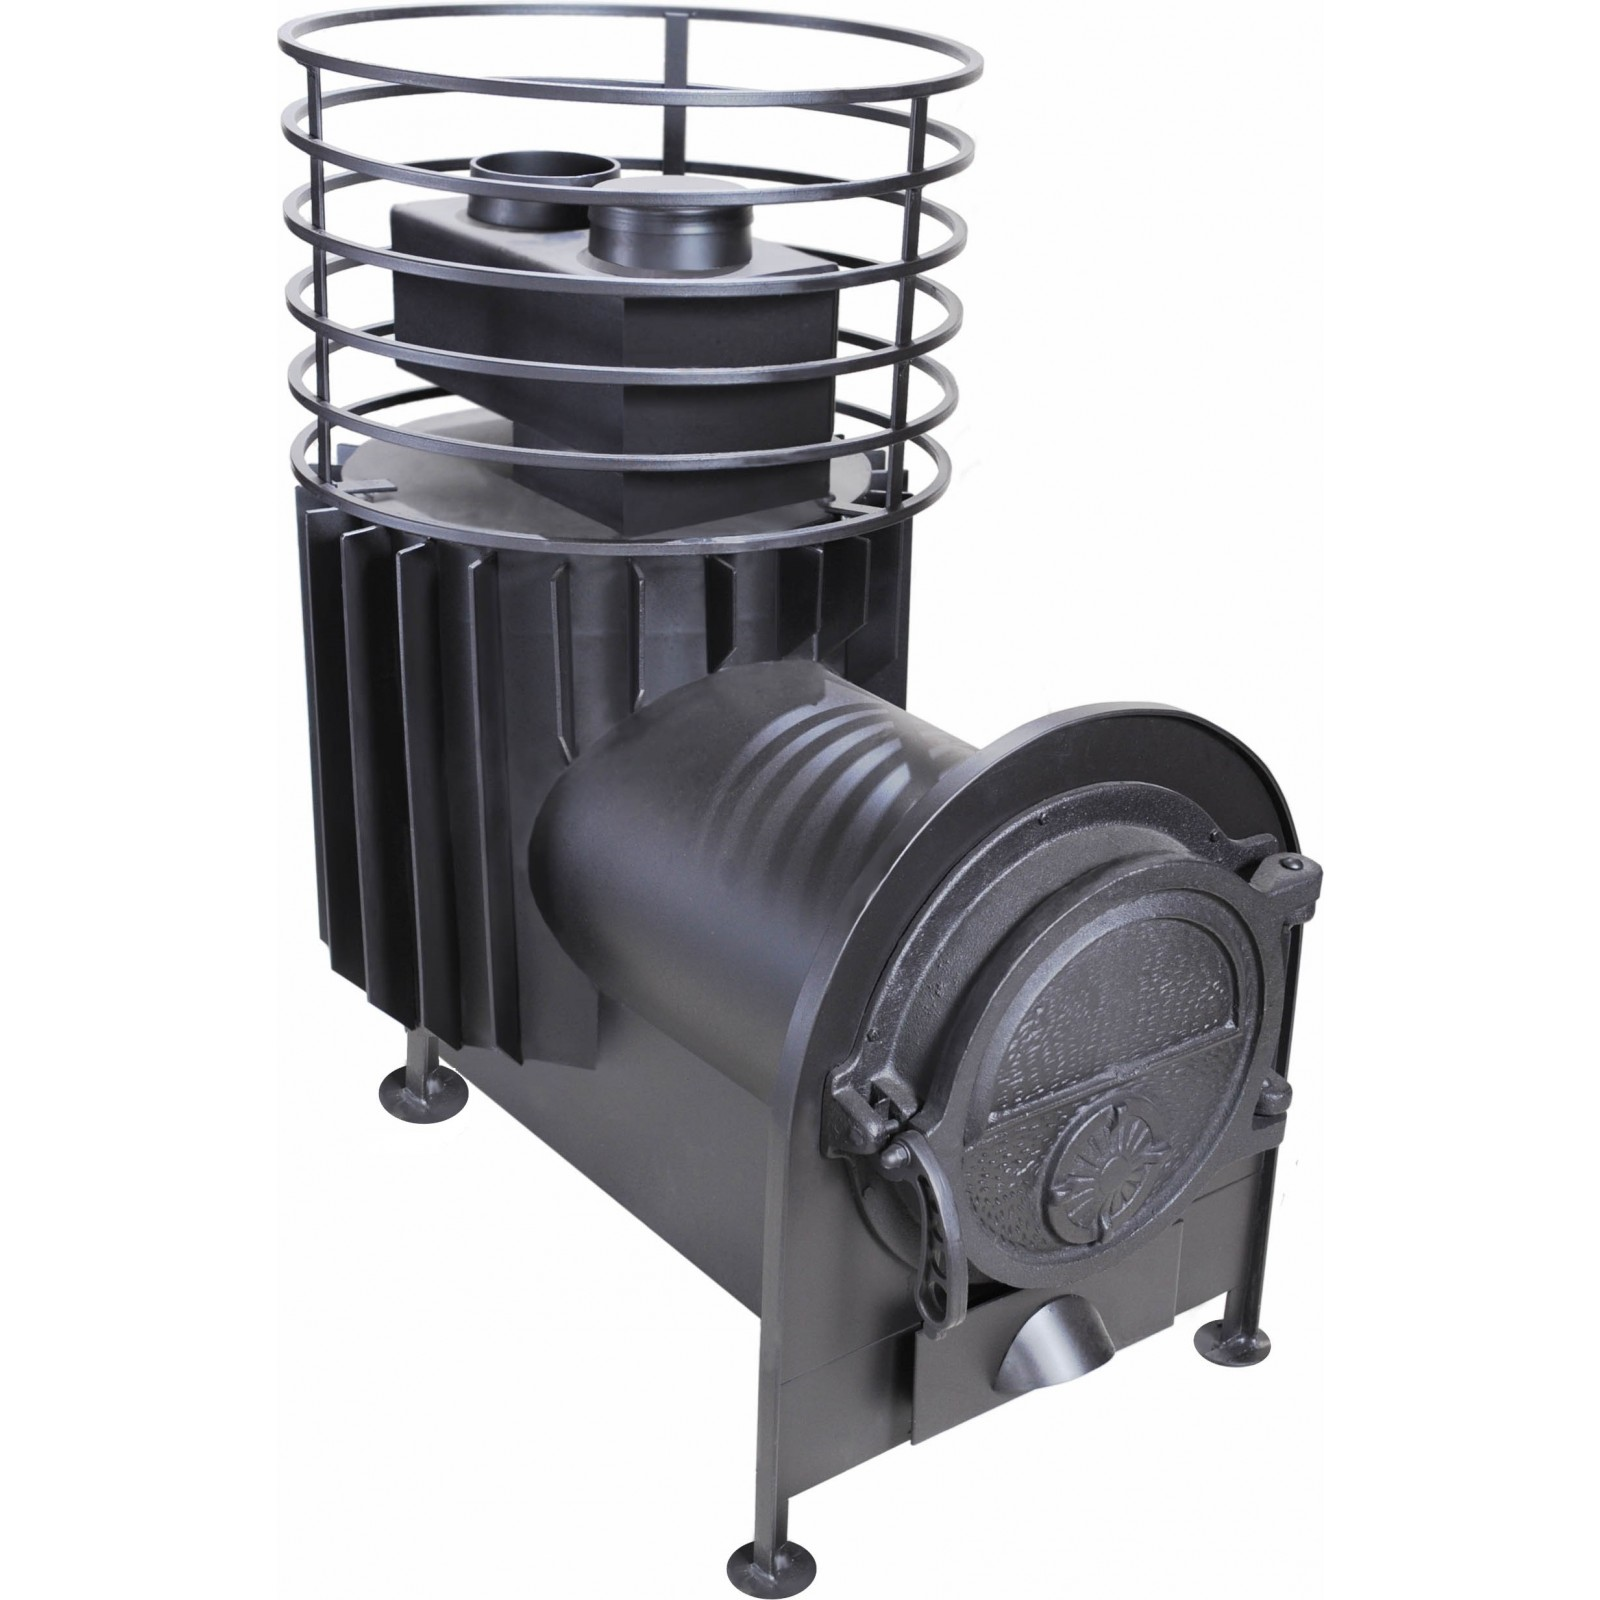 bullerjan BULLERJAN ПК-18УК (14 кВт, 8-16 м?)